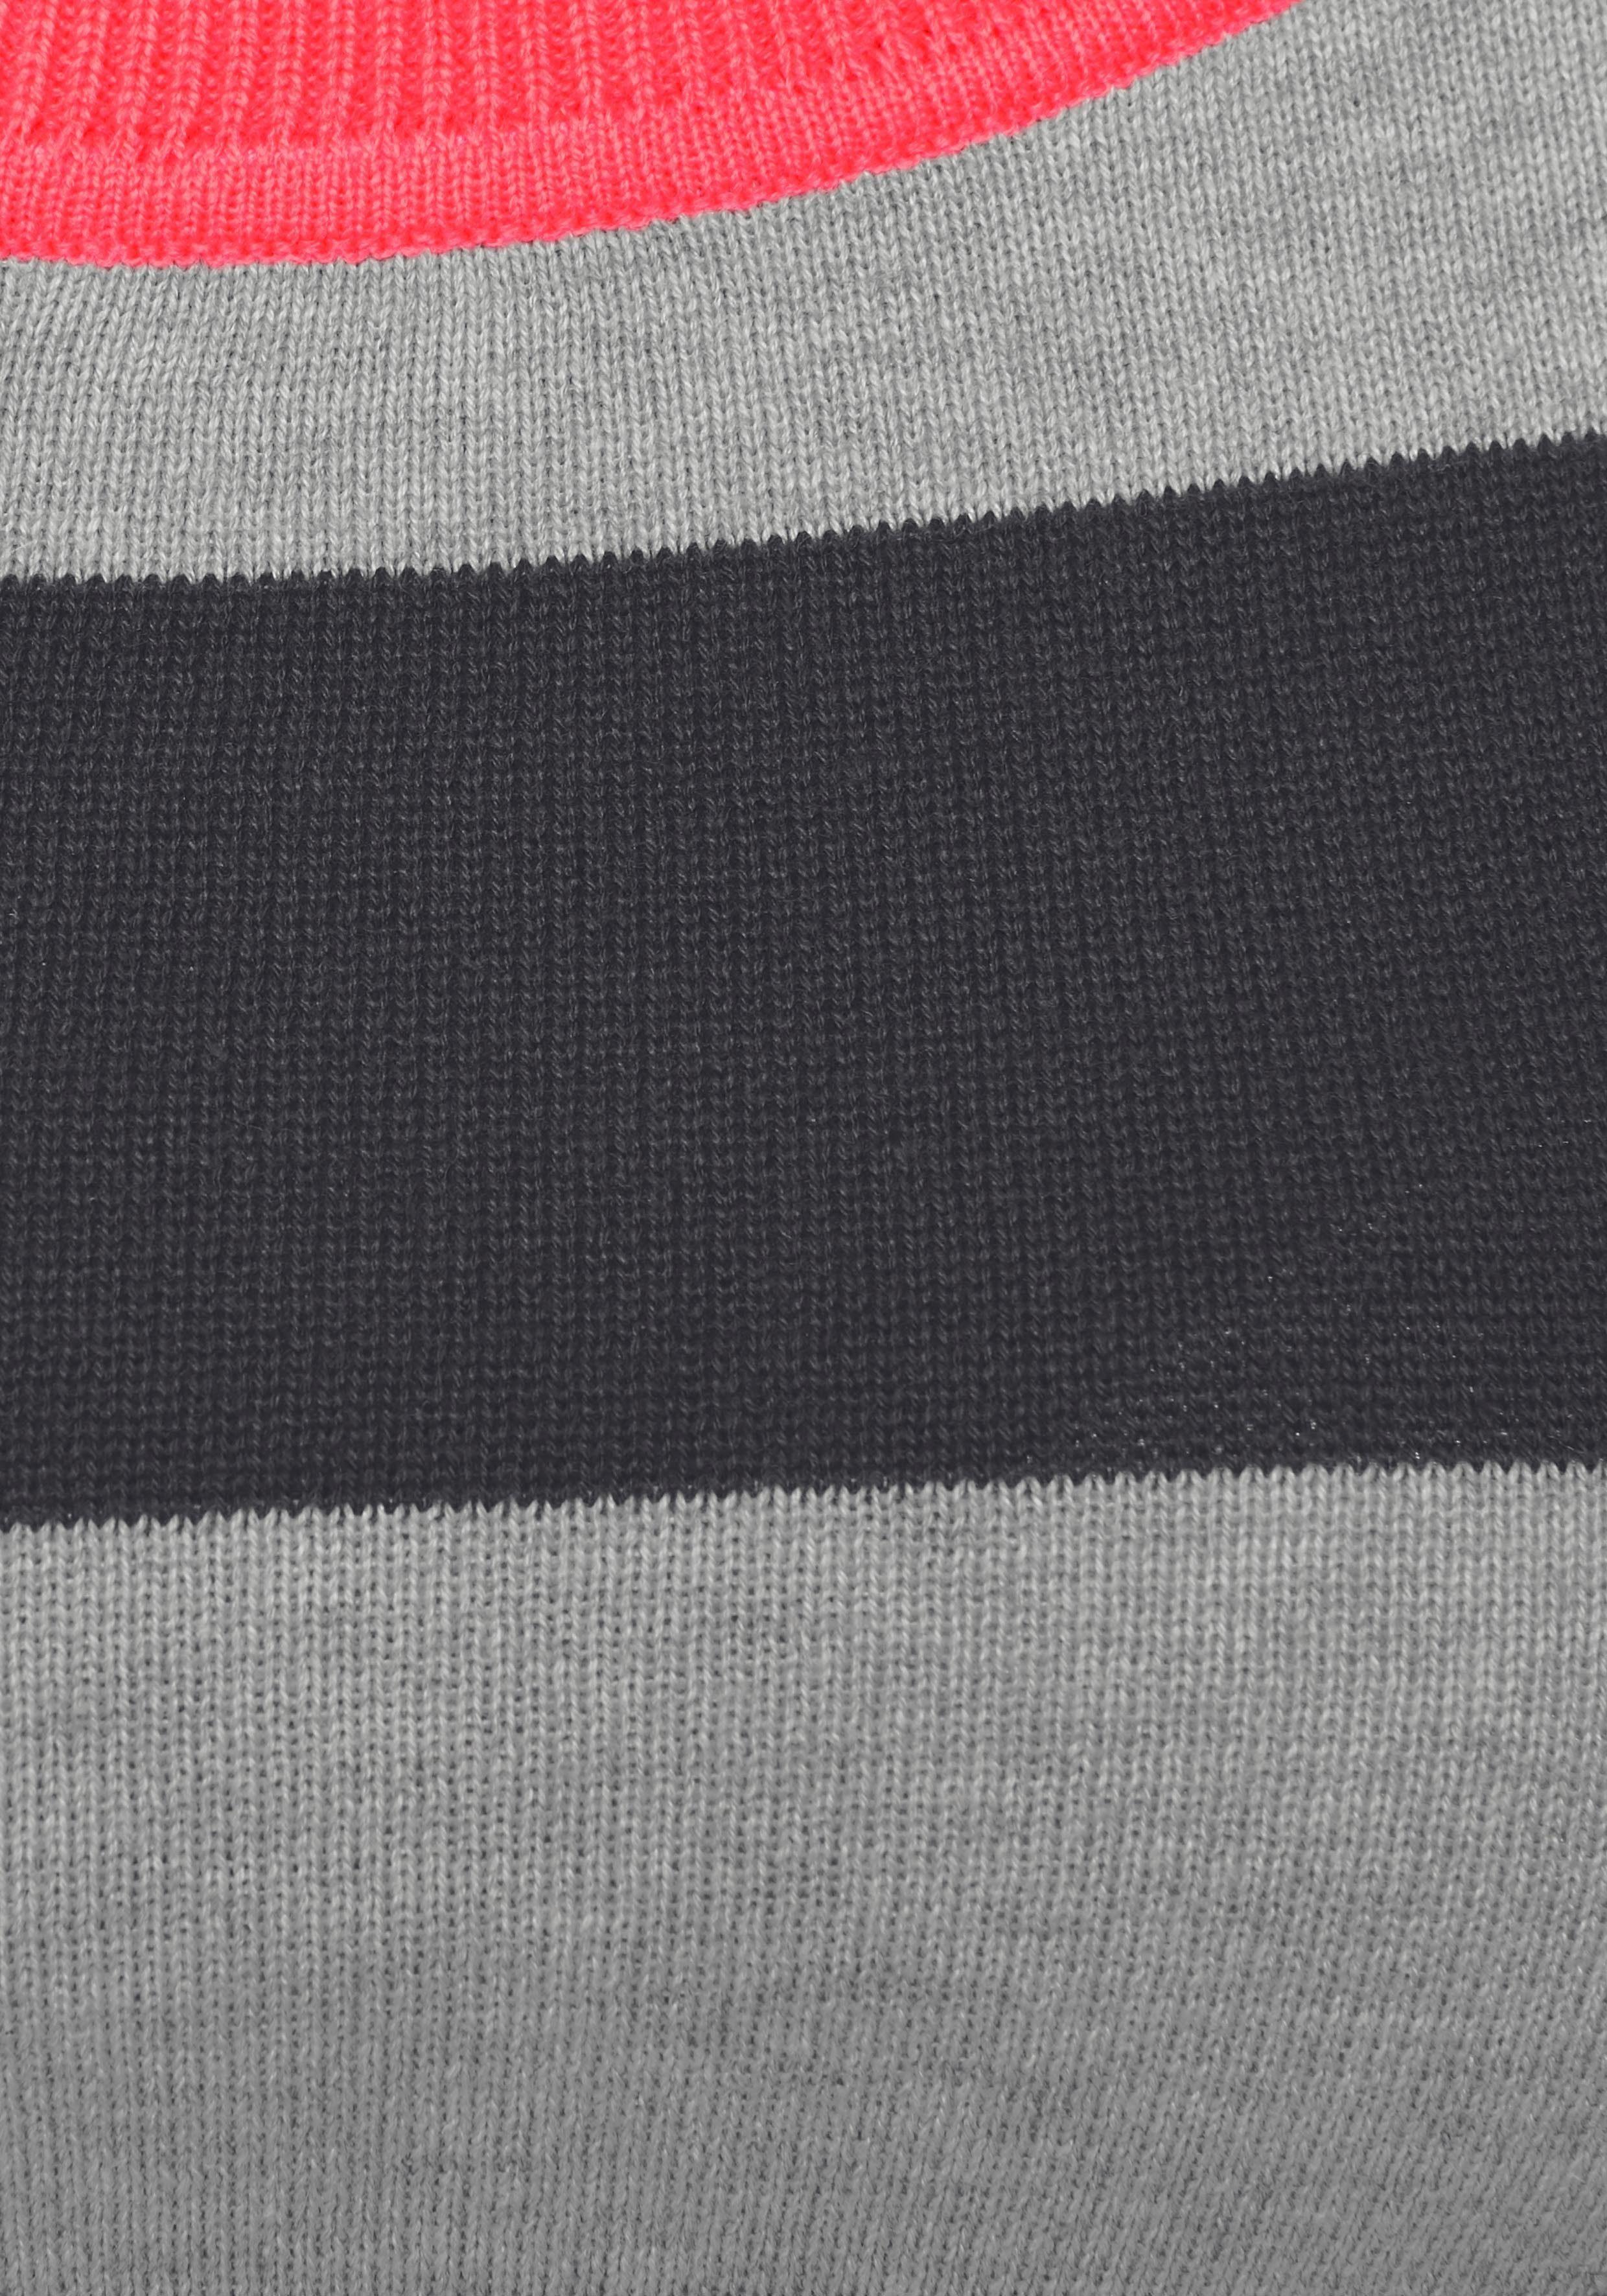 AJC Trui met blokstreepmotief in contrastkleur online shop